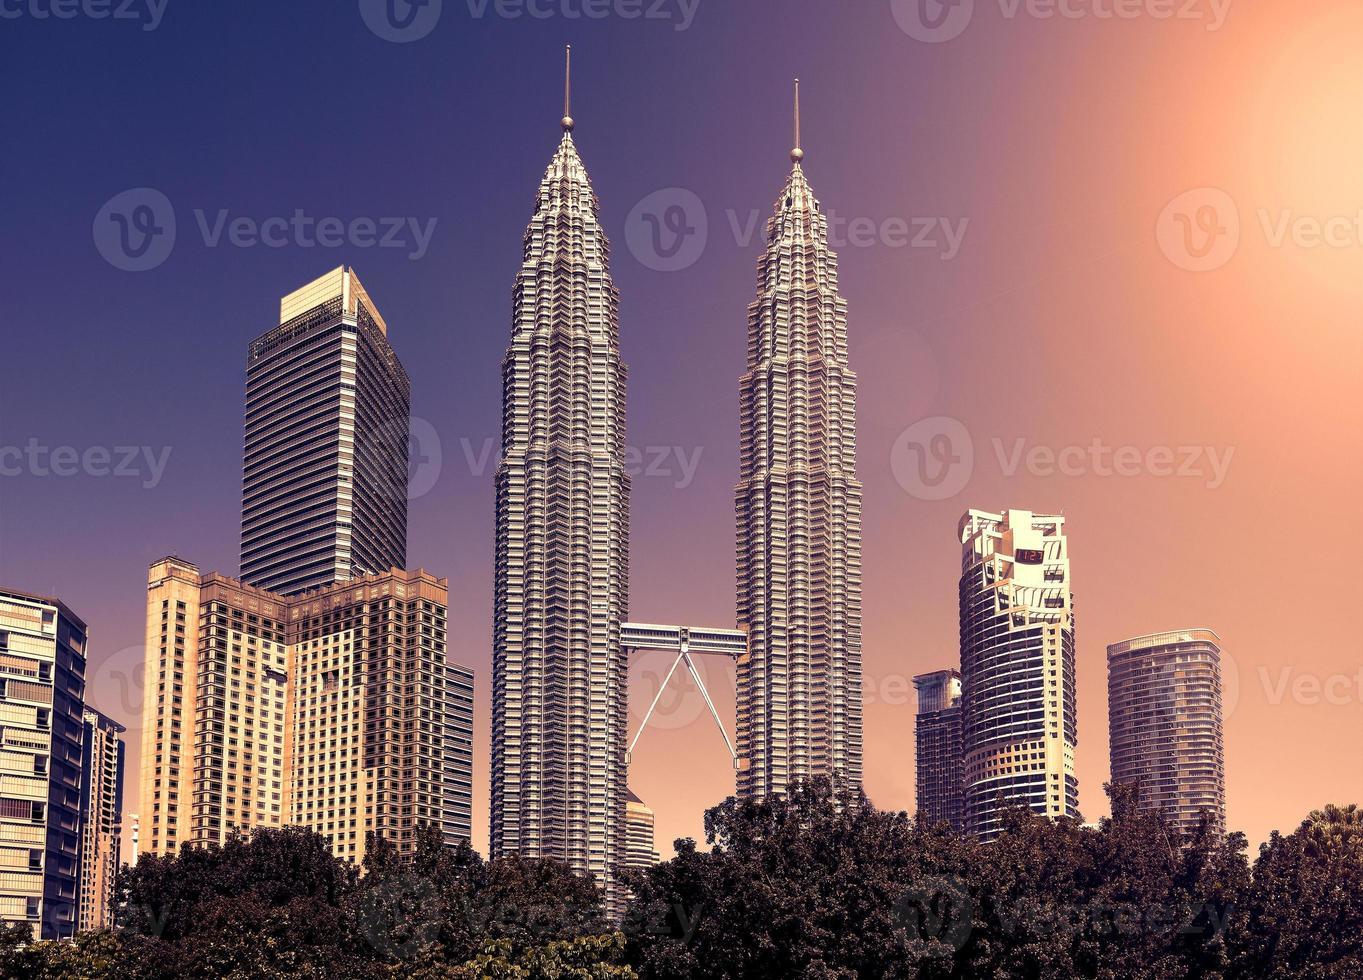 vintage tonad horisont av Kuala Lumpur, Malaysia. foto